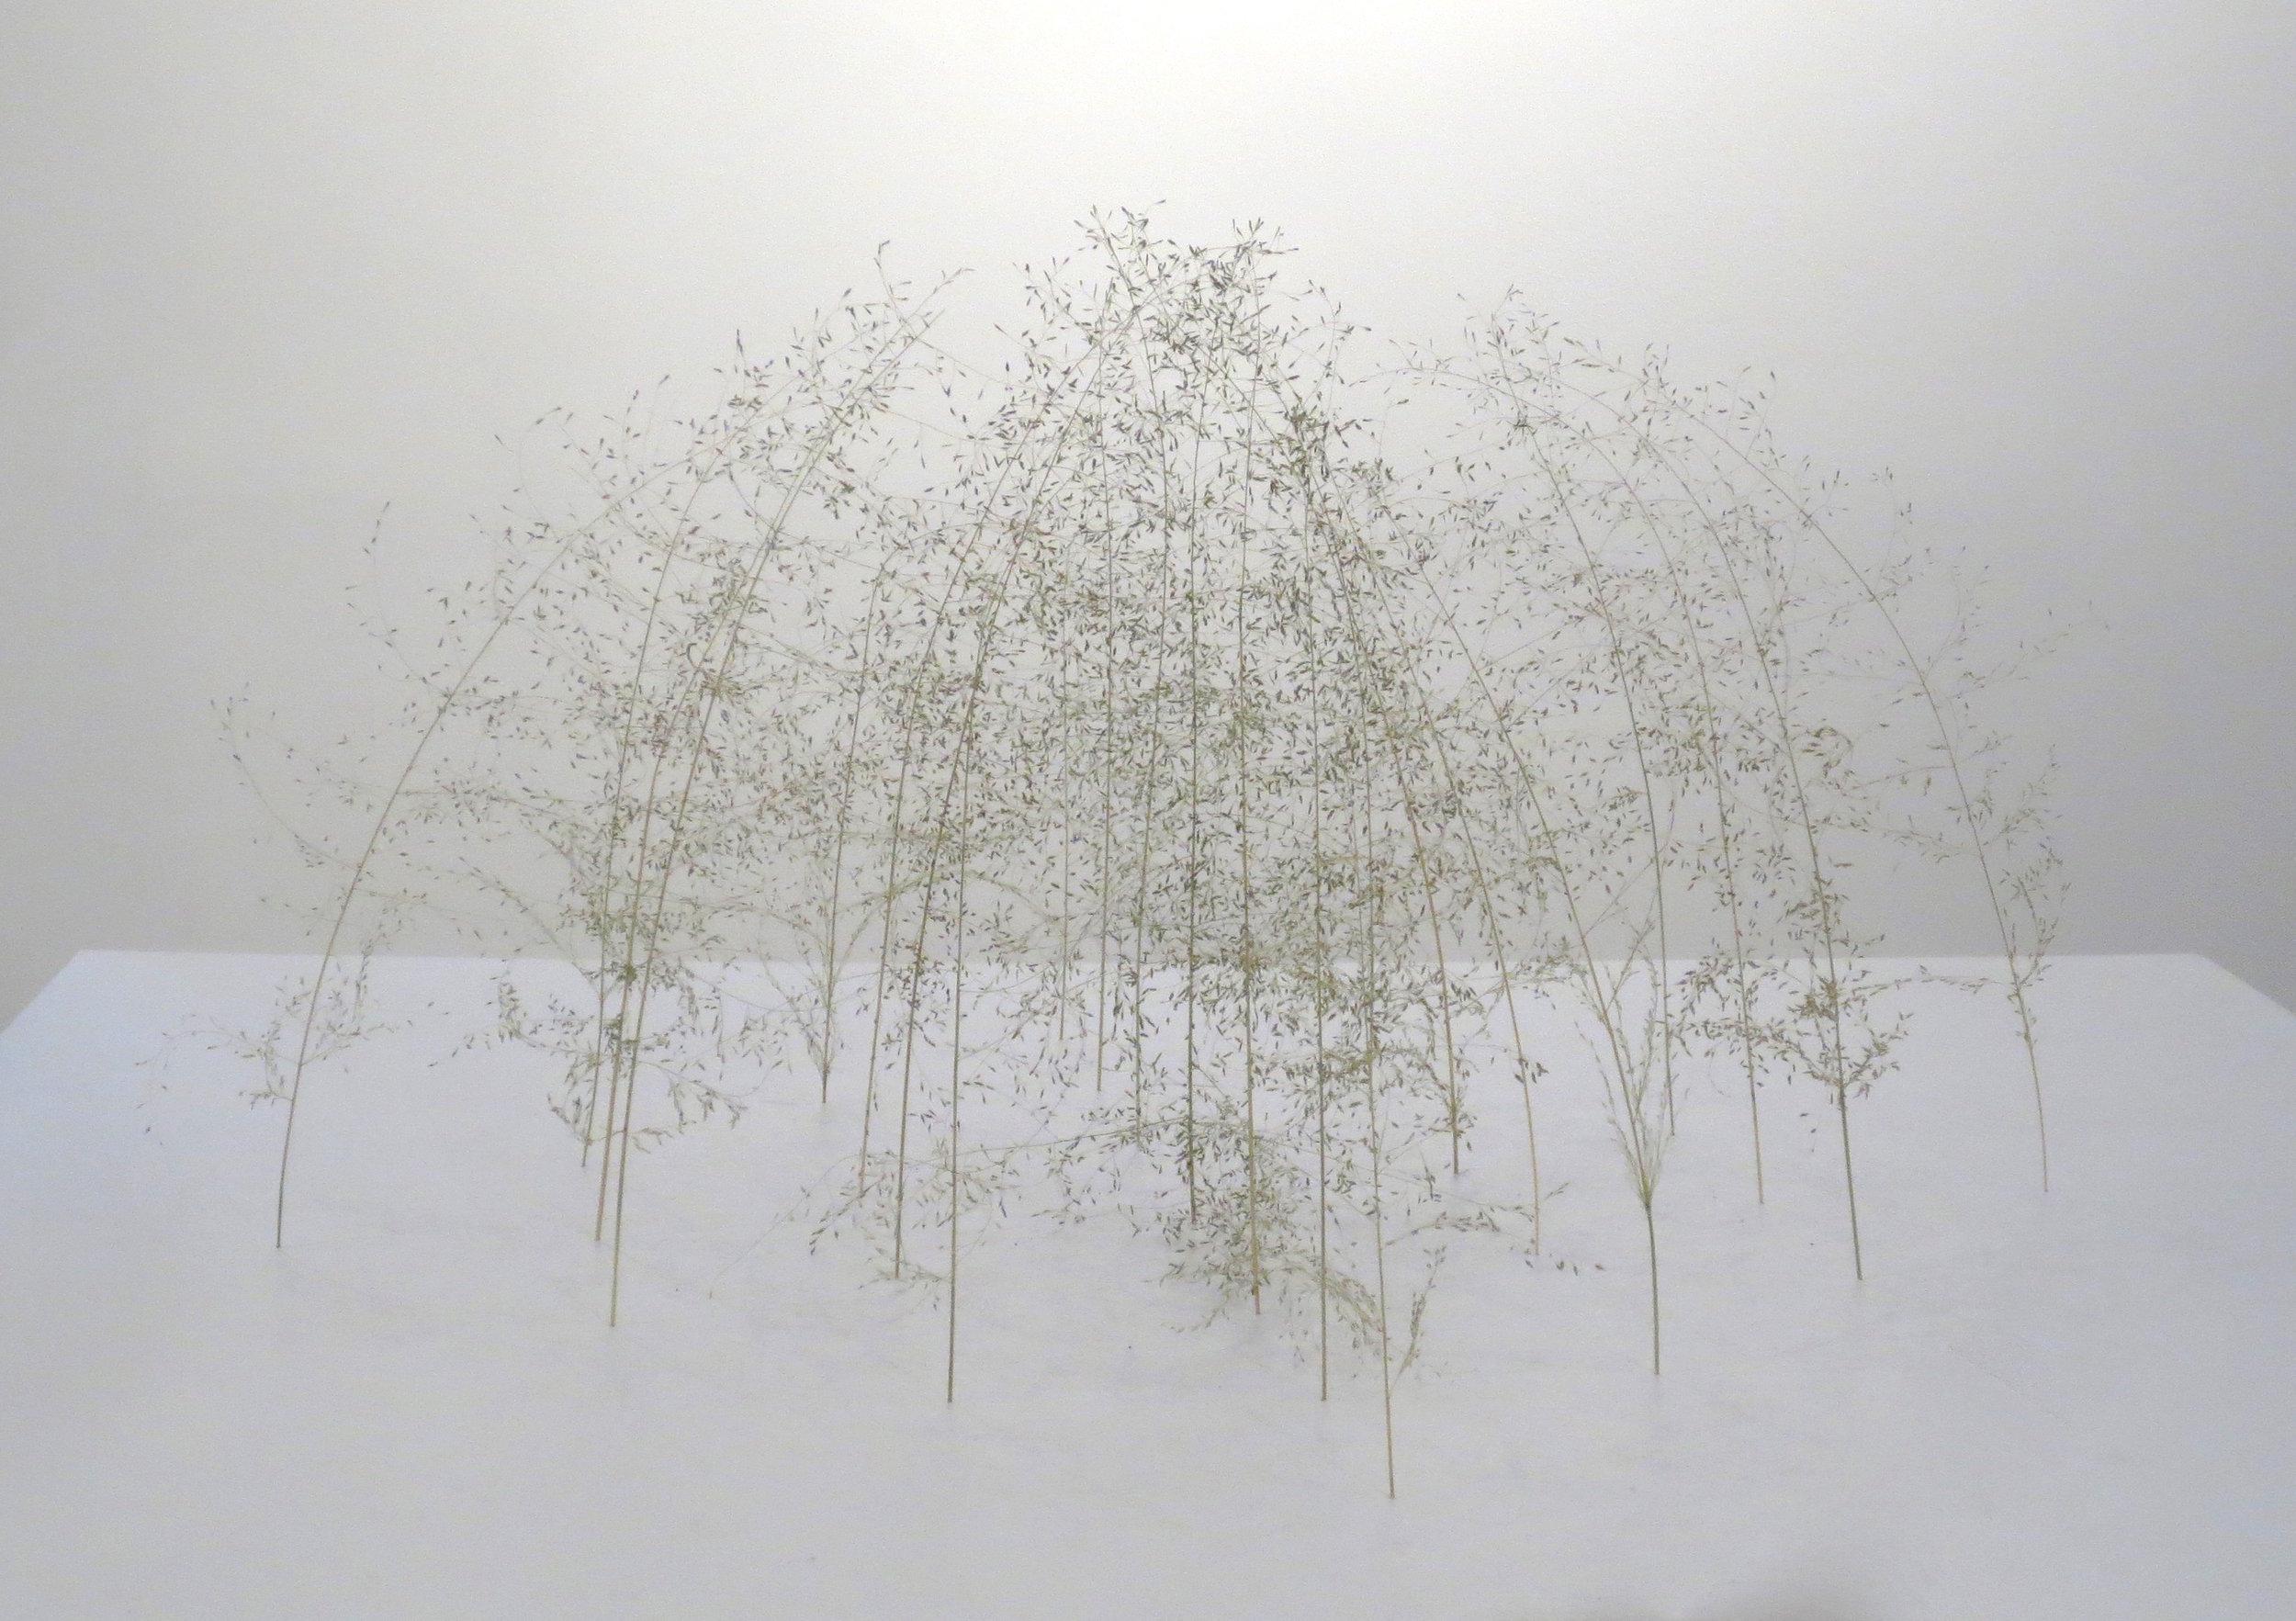 Christiane Löhr  (B. 1965)  Grass Cube [Grasquader] , 2018 Grass Stalks 11 3/4 x 21 1/2 x 21 1/2 inches 30 x 55 x 55 cm